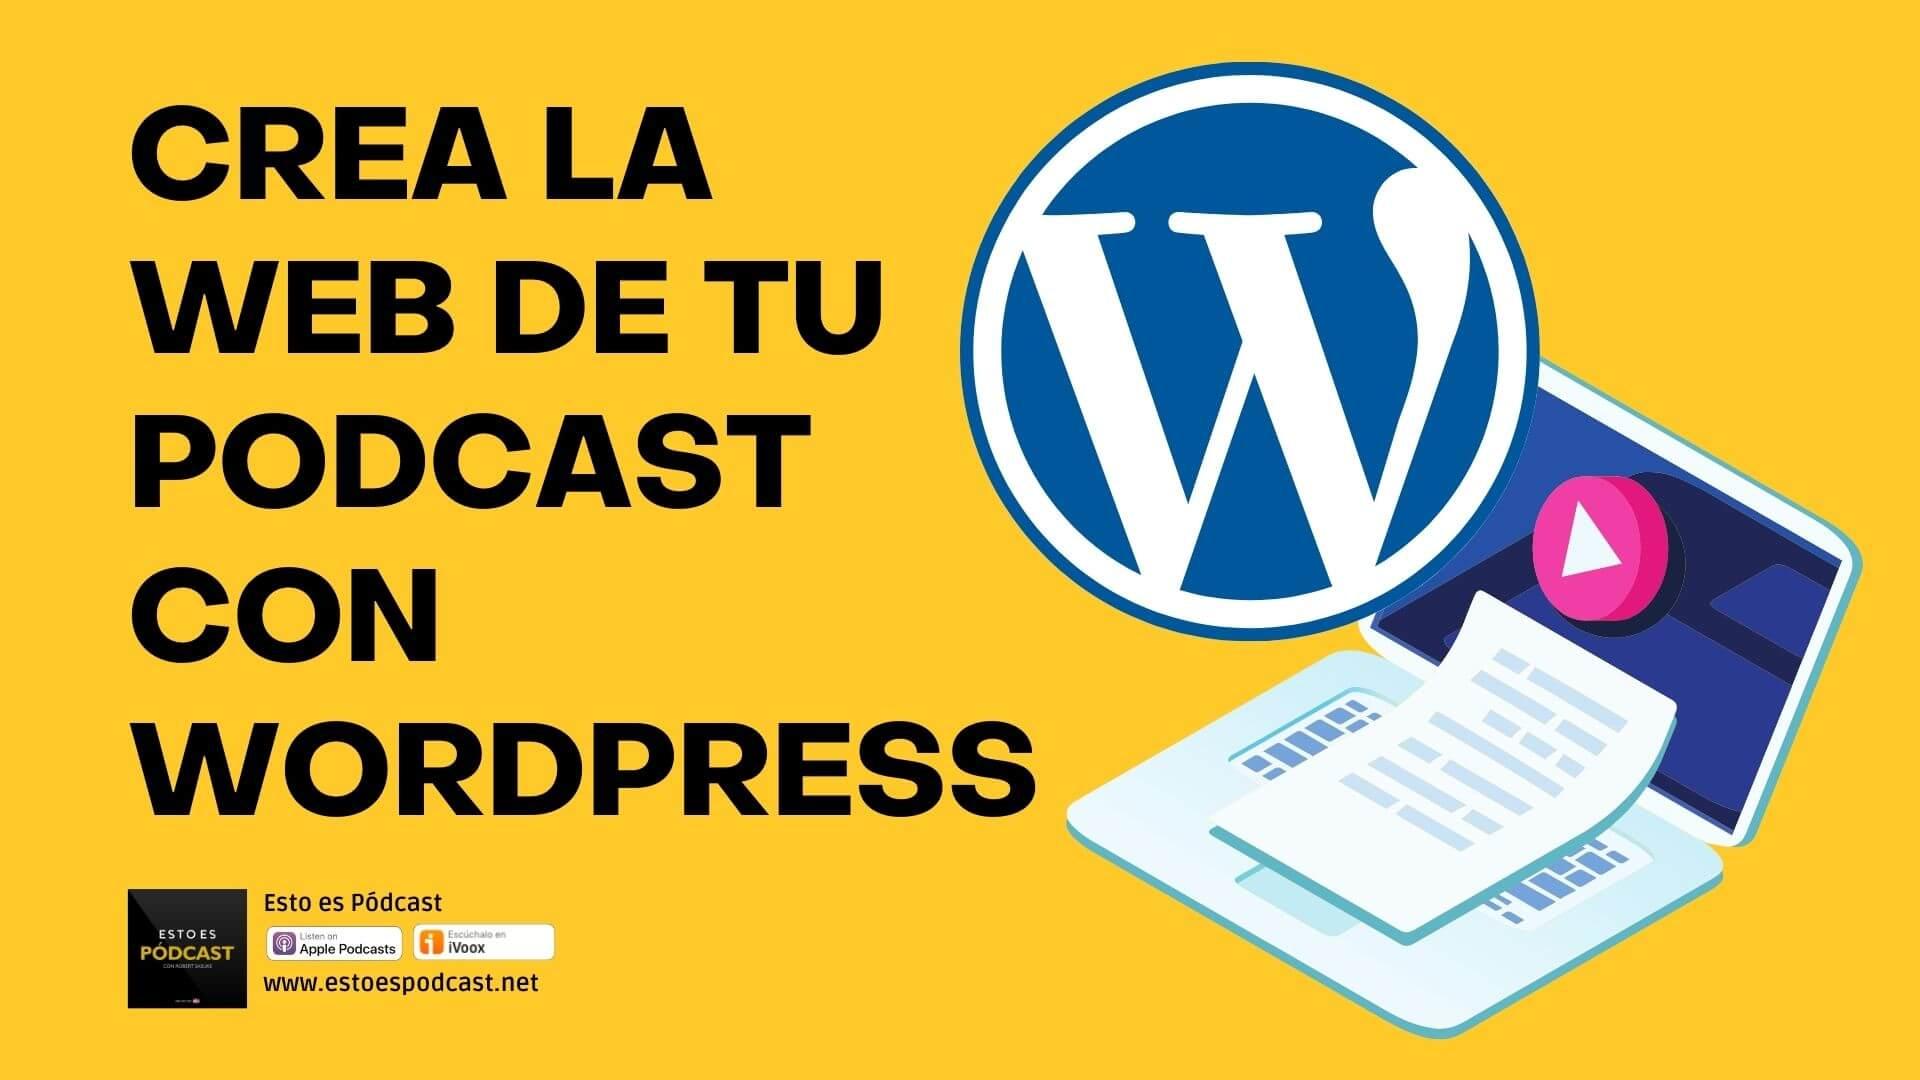 Crea una web escalable para tu podcast con Wordpress.org